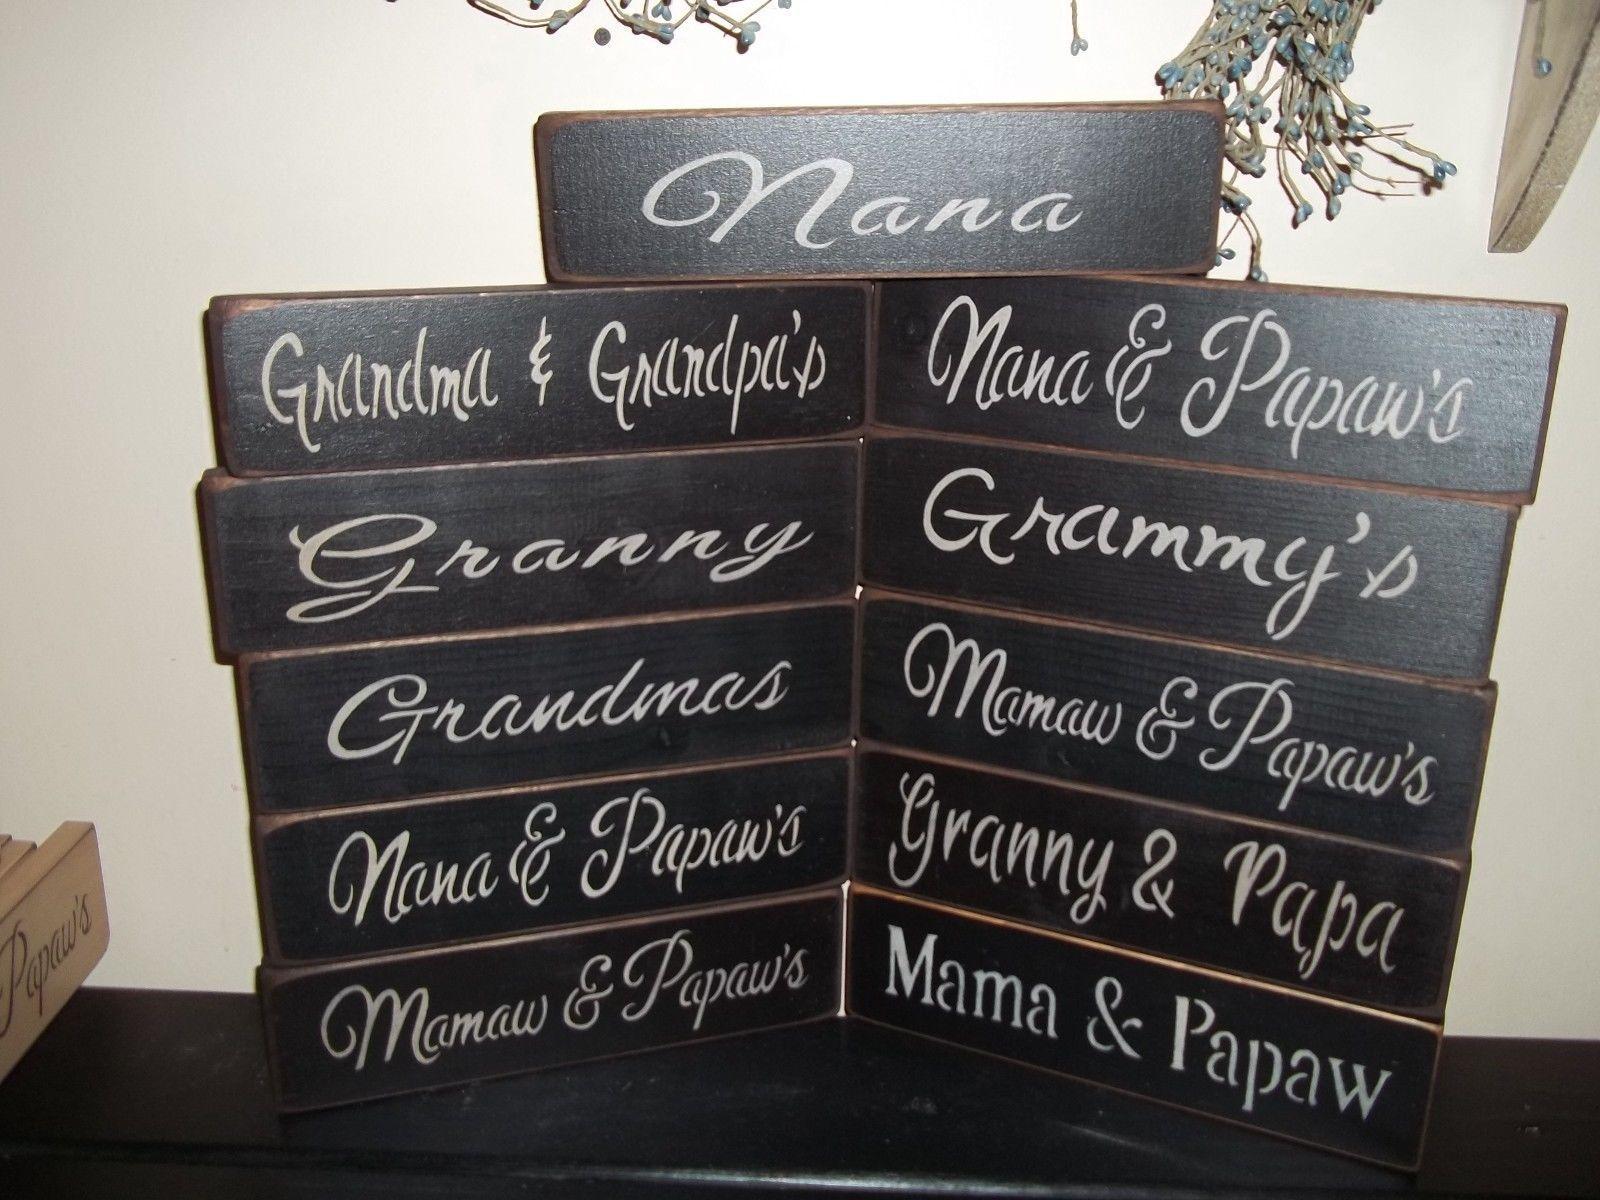 Wood Signs Grandparents u0026 Nana Papawu0027s Grandmau0027s